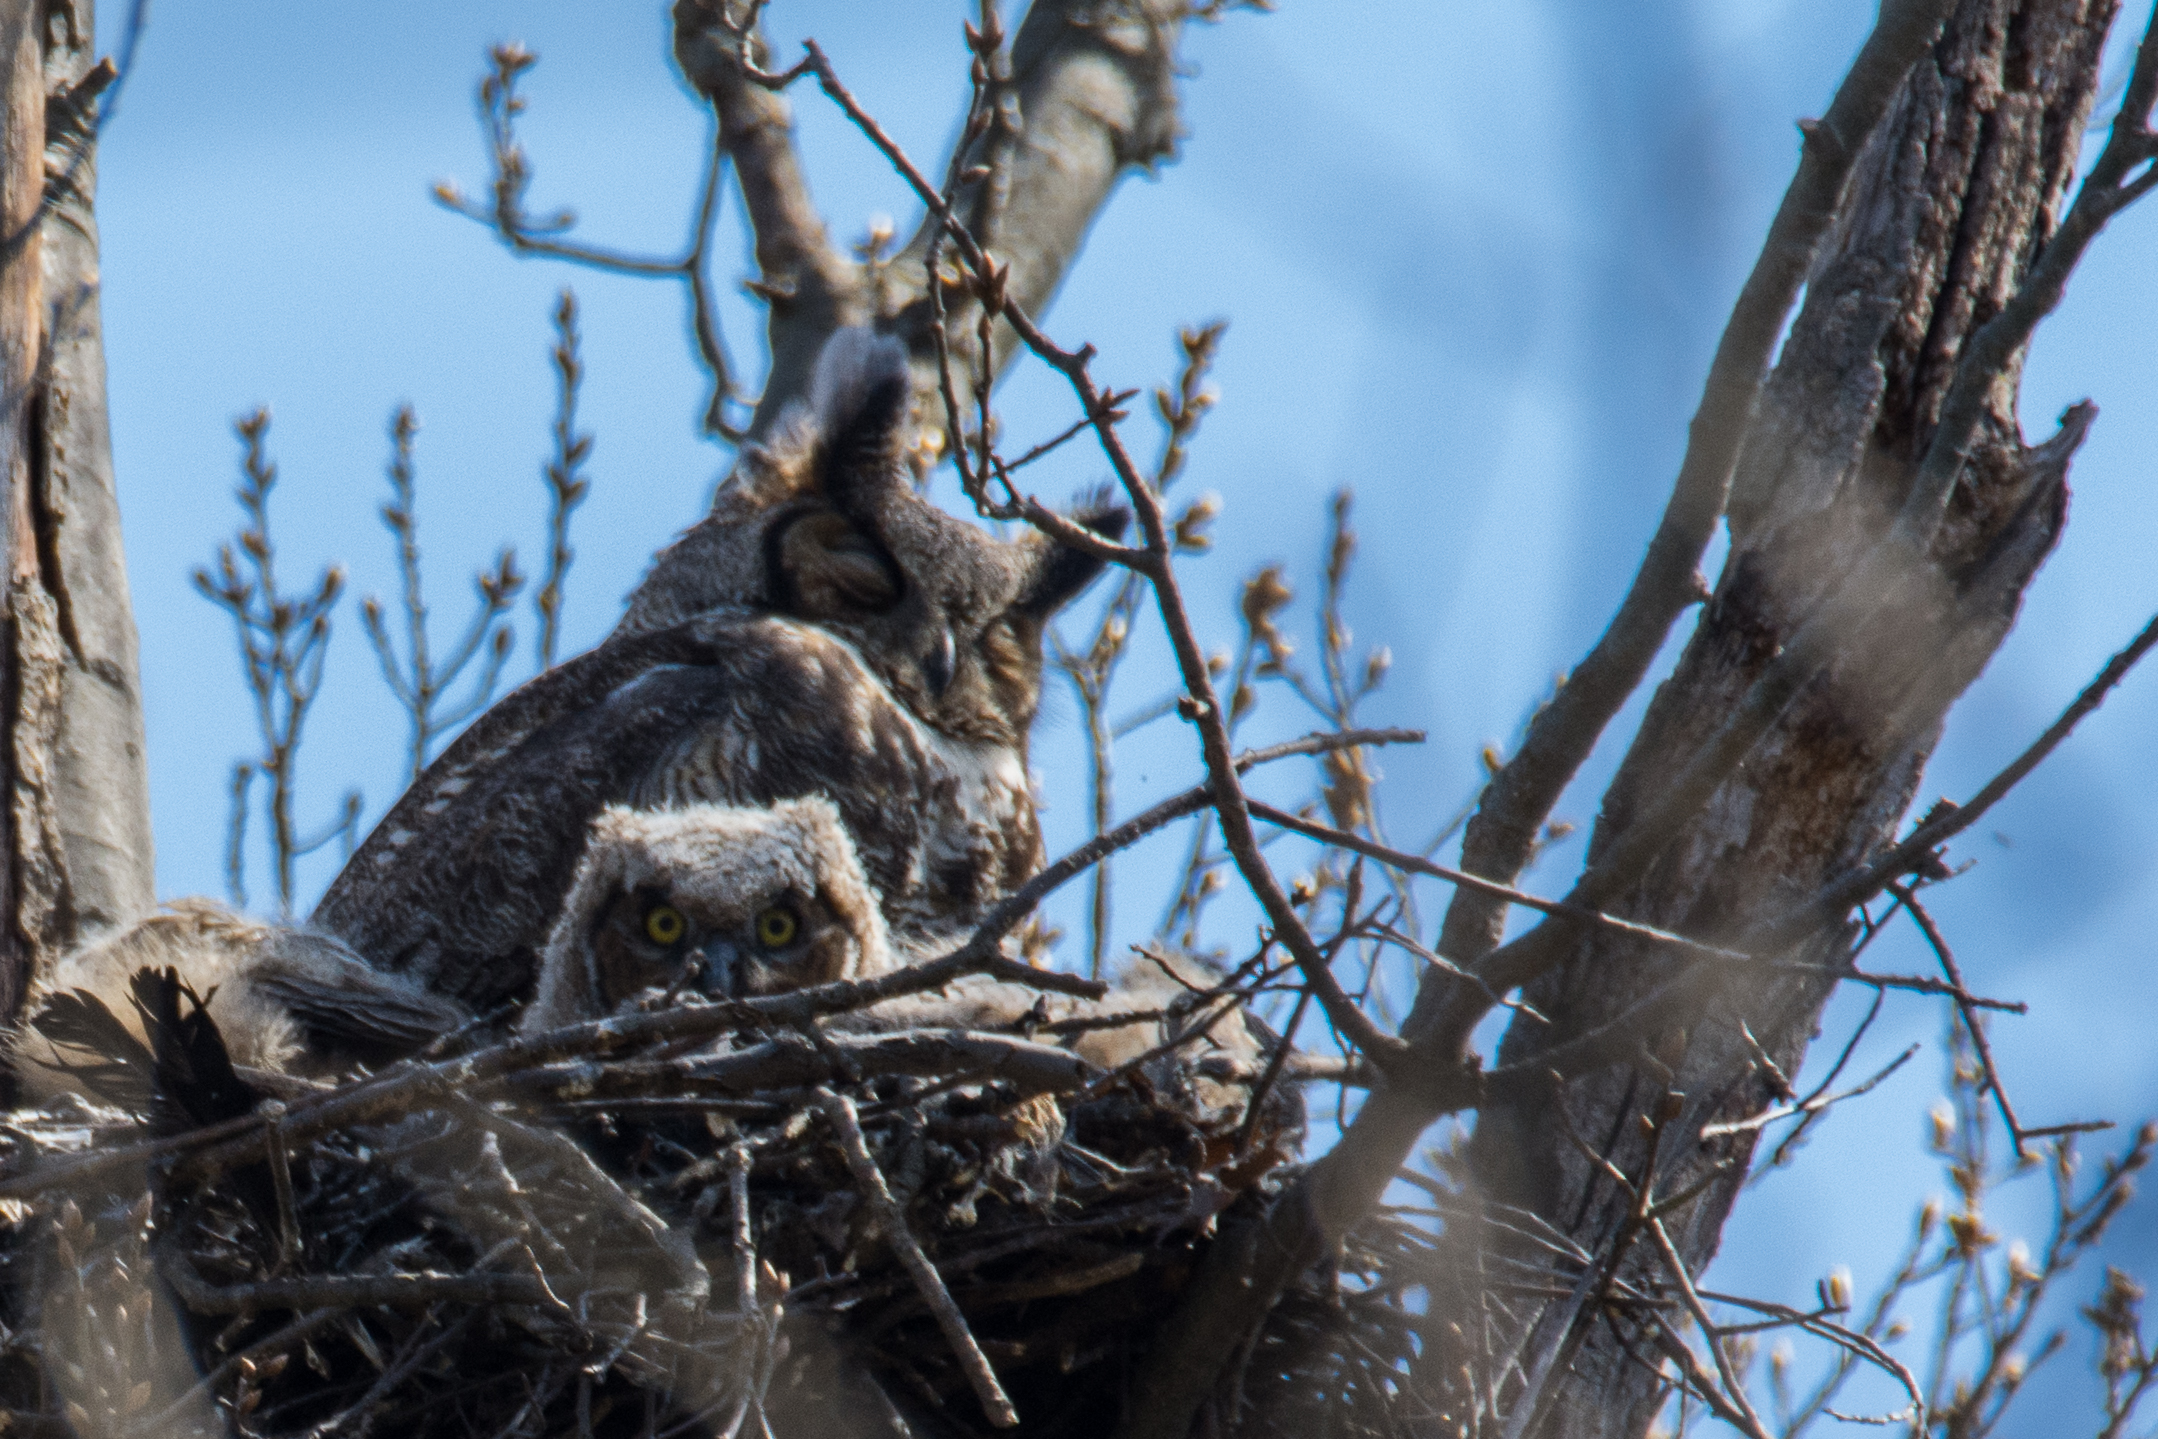 Great Horned Owlet  Nikon D7100 600mm ISO 500 f/10 1/400 sec (heavy crop)